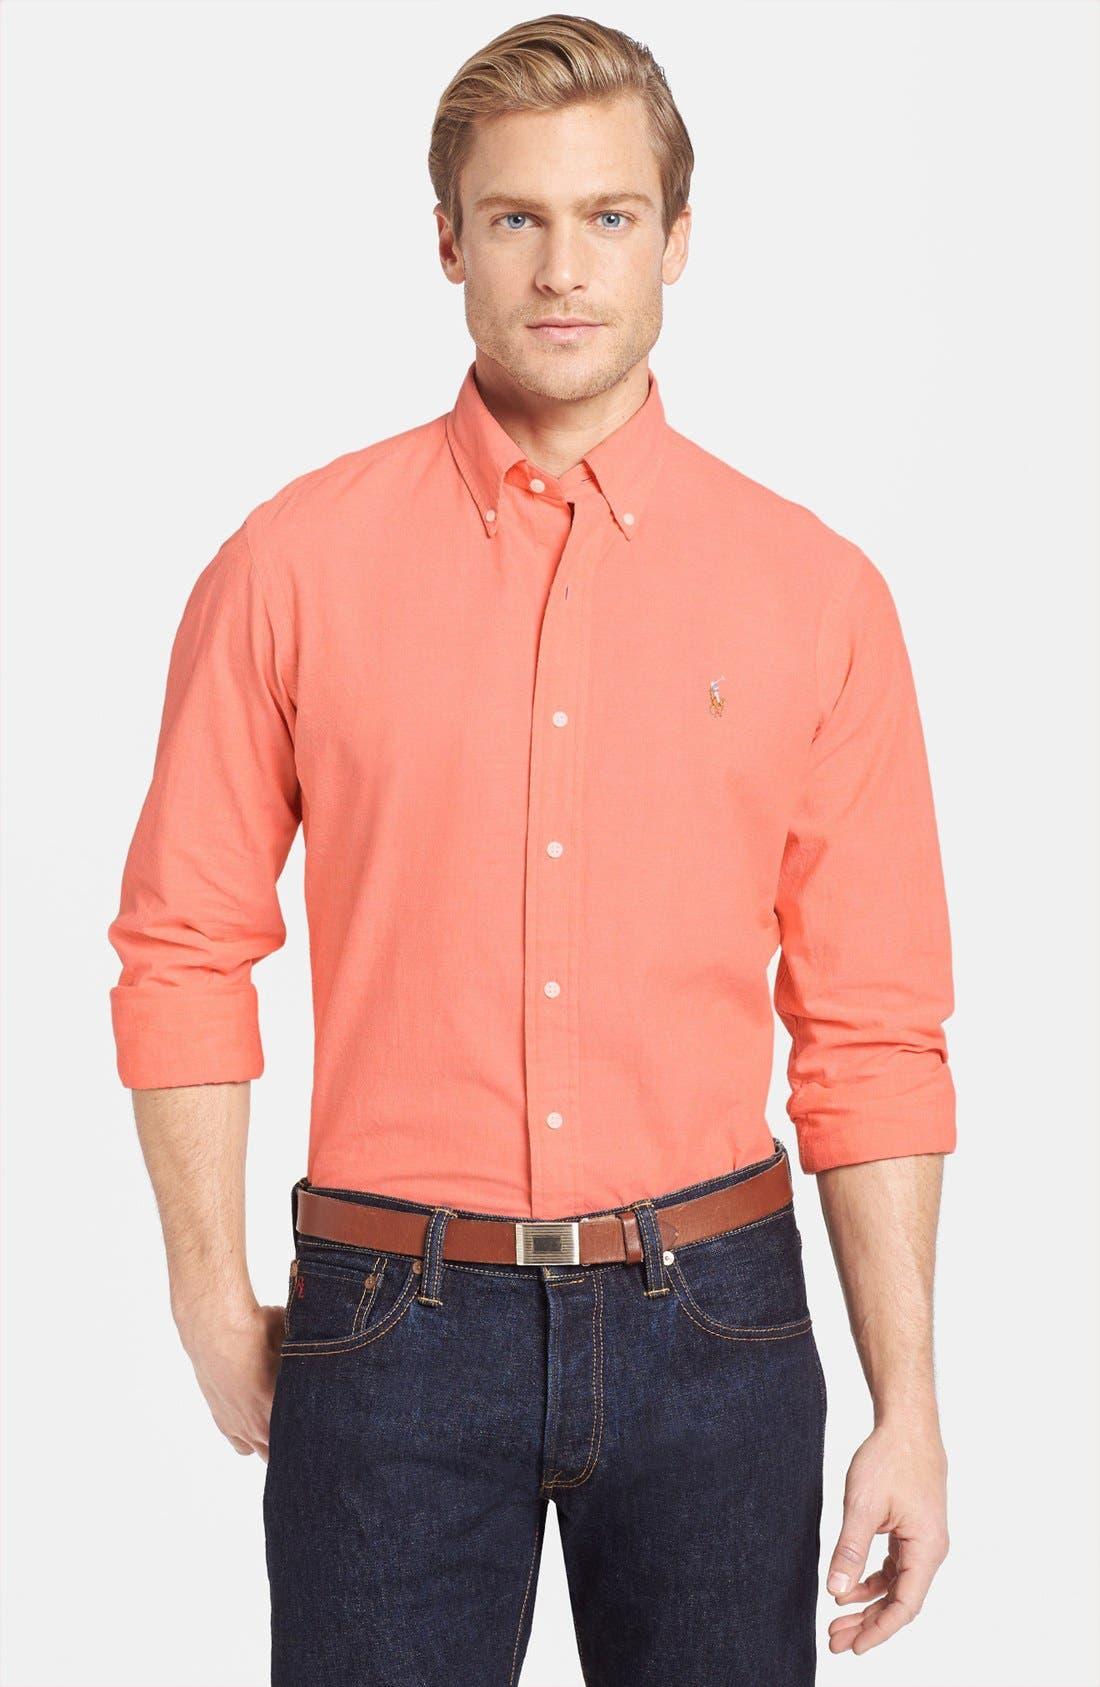 Alternate Image 1 Selected - Polo Ralph Lauren Custom Fit Chambray Sport Shirt